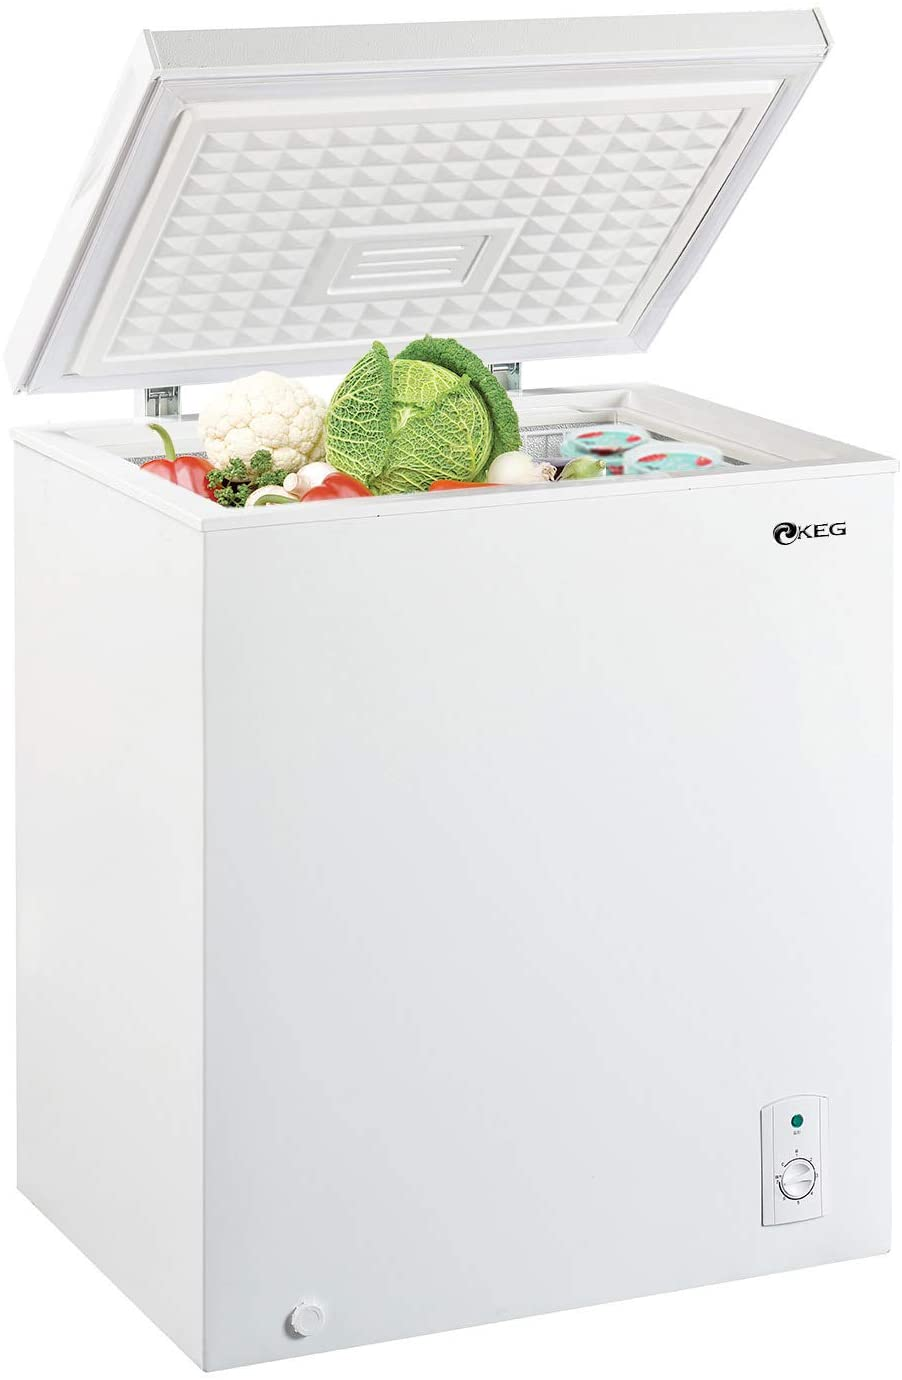 Freezer 5.5 CFT KEG